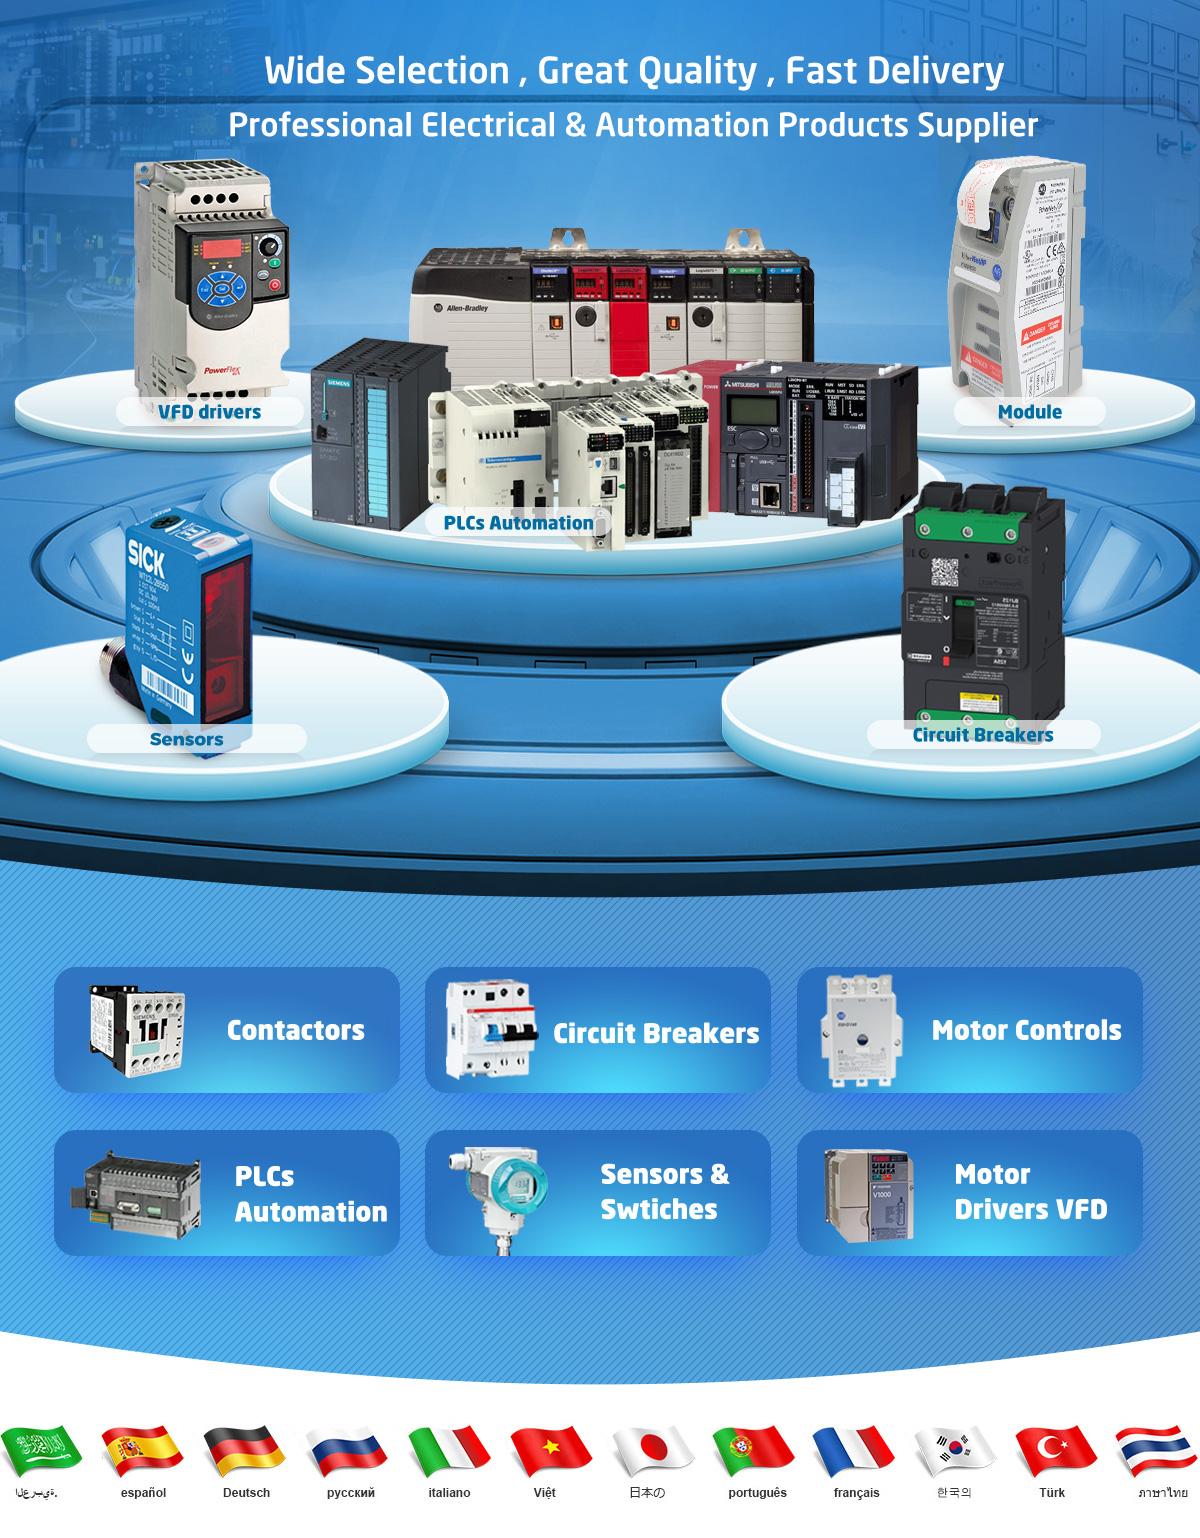 Simply Buy (Shanghai) Trade Co , Ltd  - Electrical Controls, VFD Driver